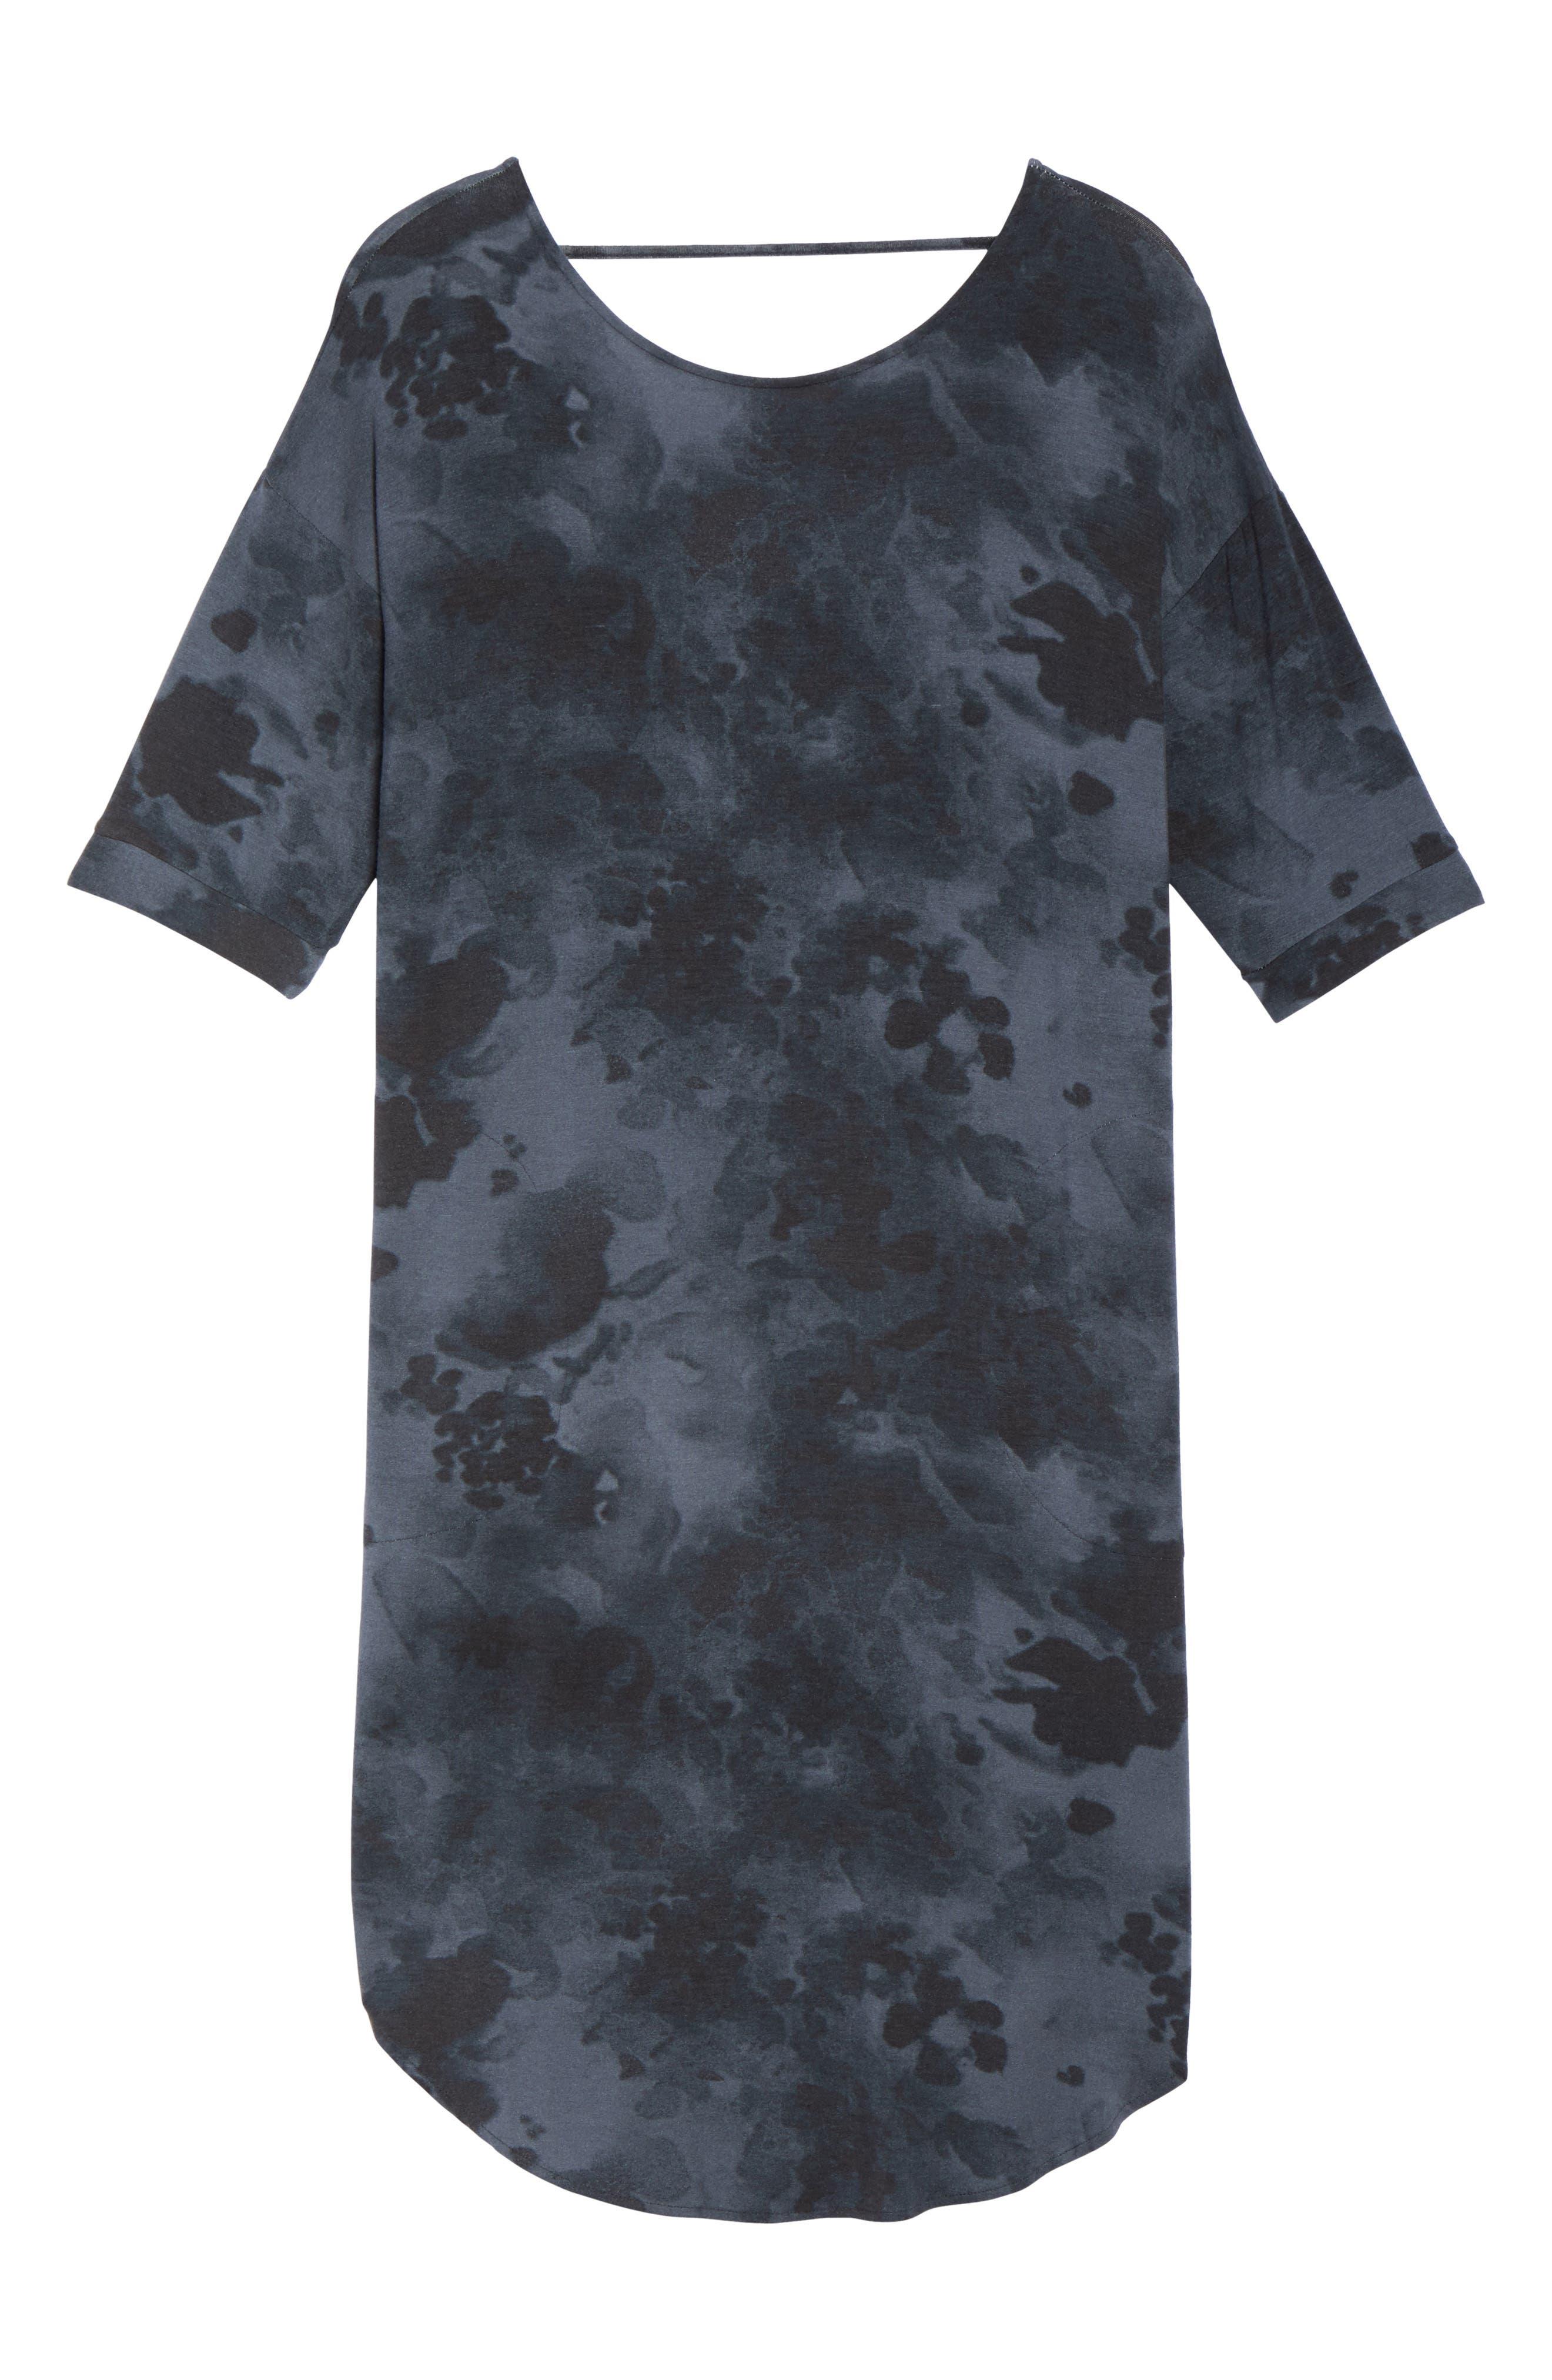 Jersey Sleep Shirt,                             Alternate thumbnail 6, color,                             Grey Floral